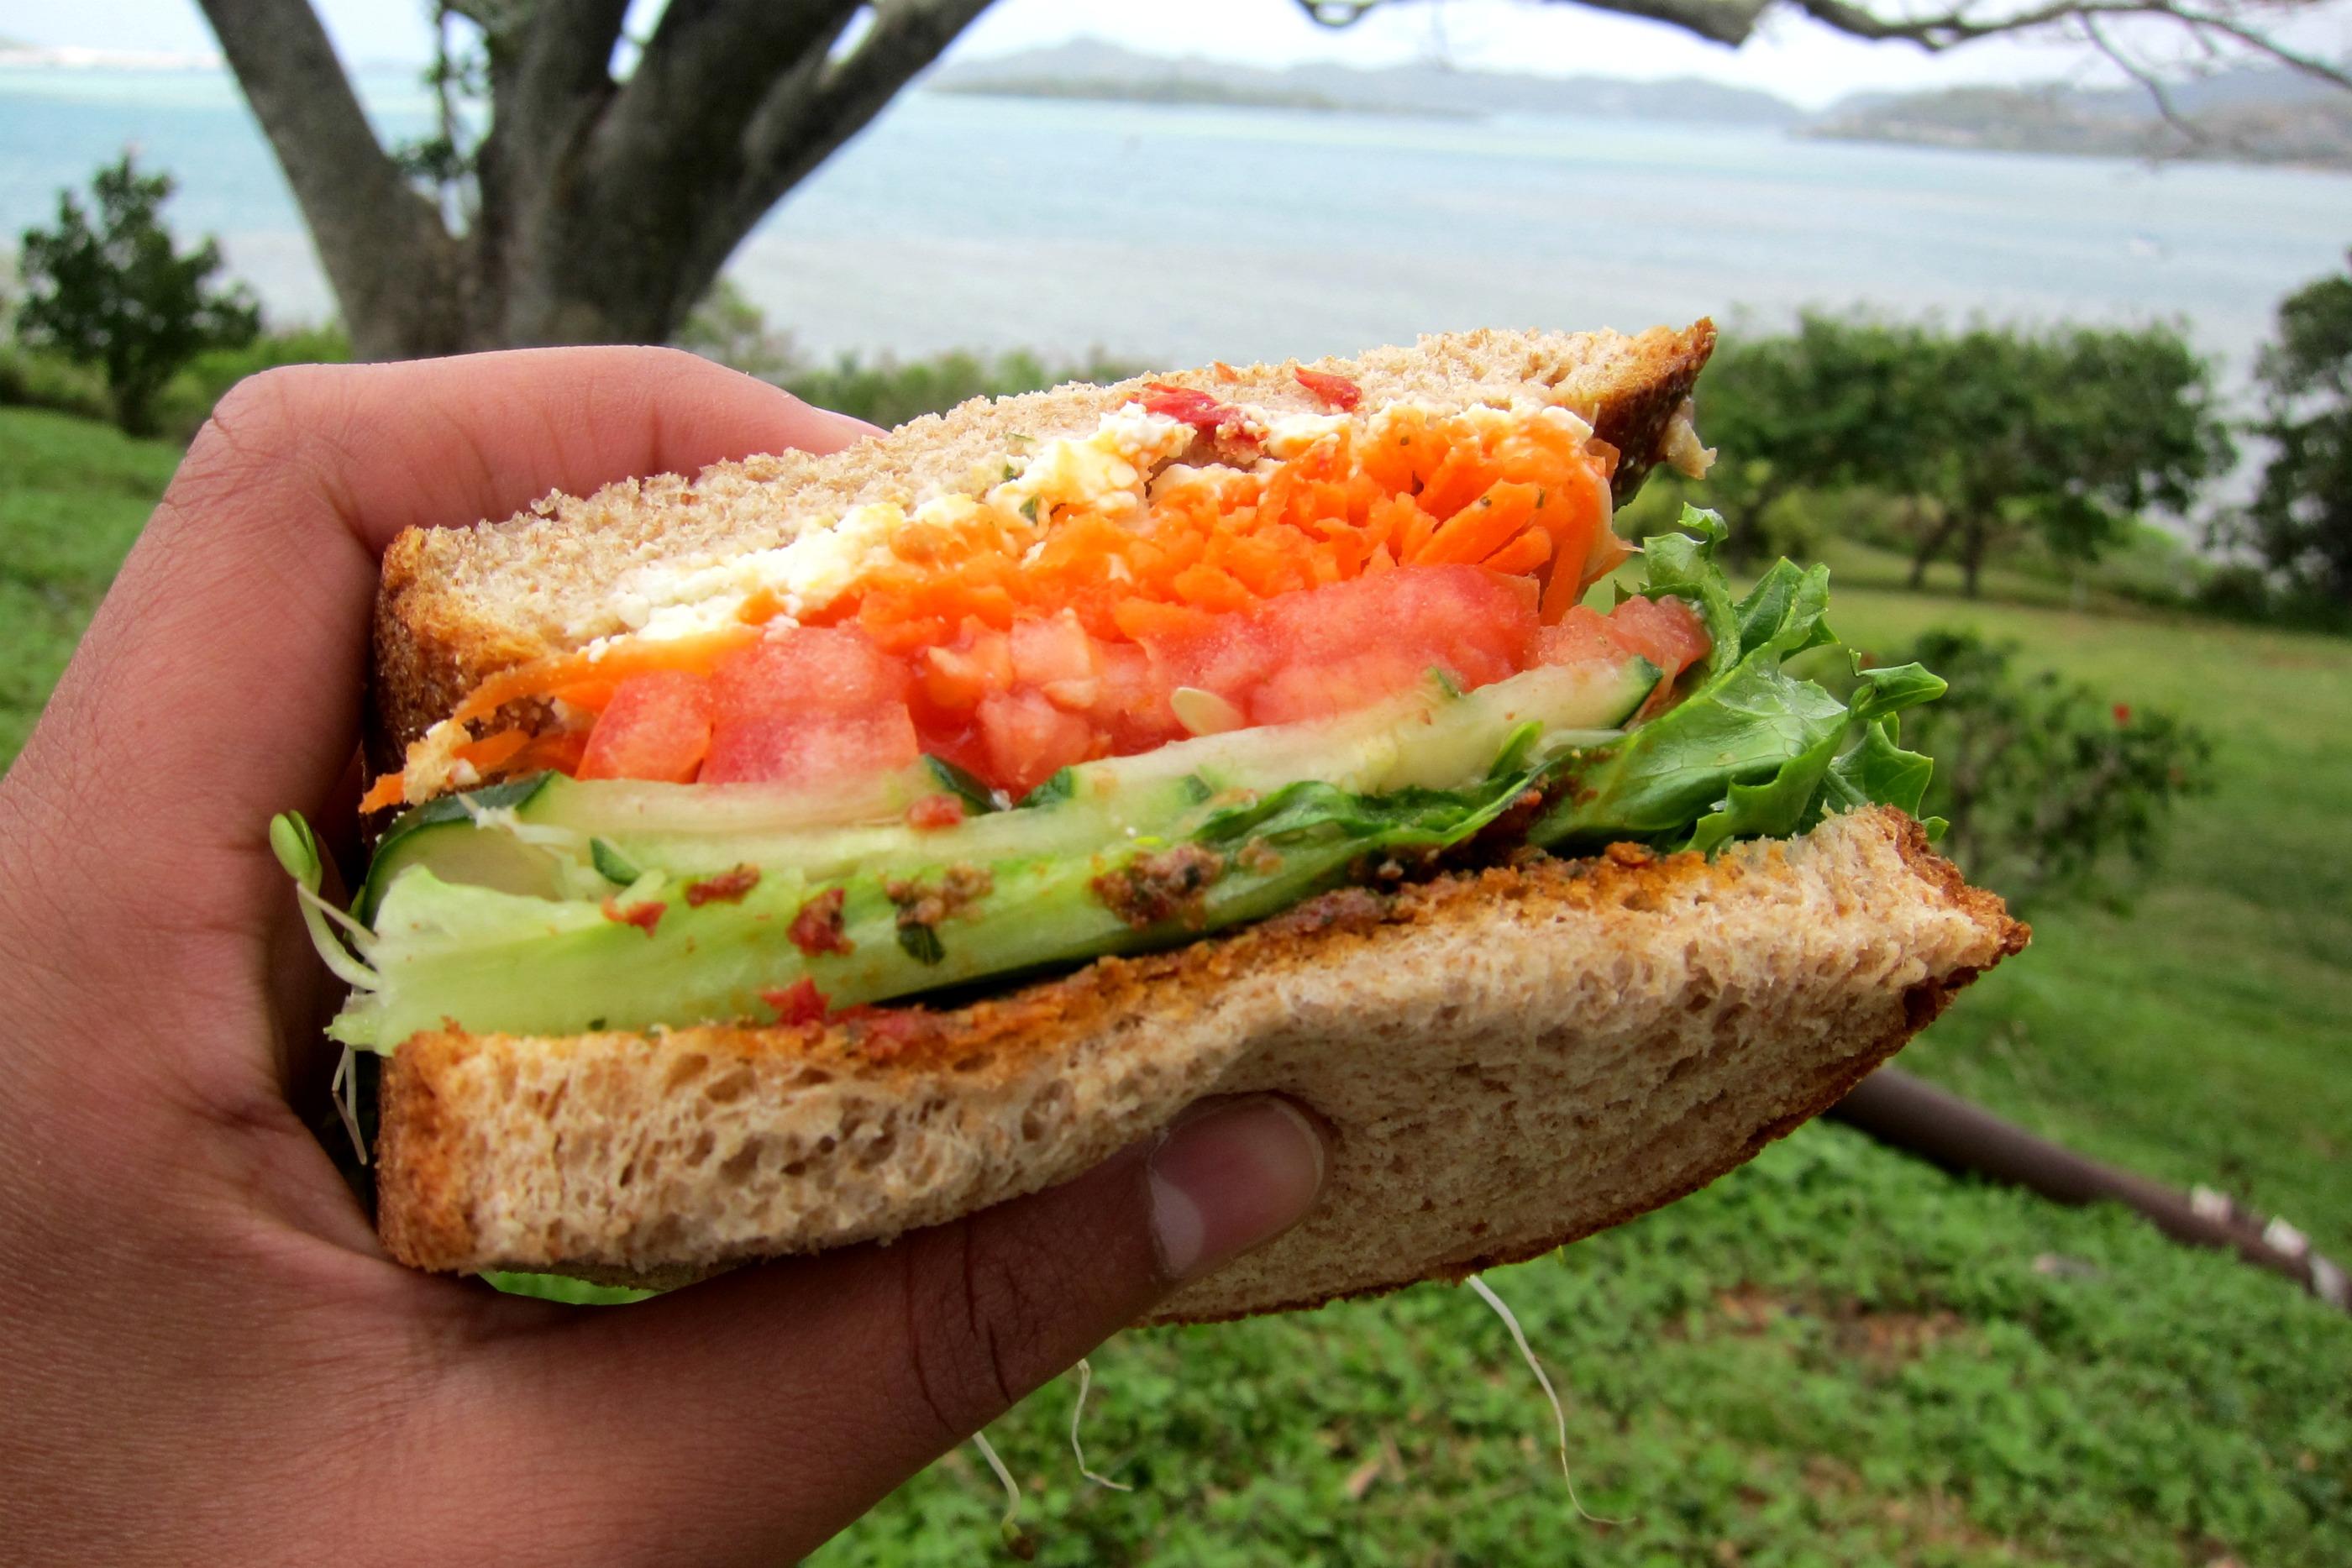 Kailua market sandwich